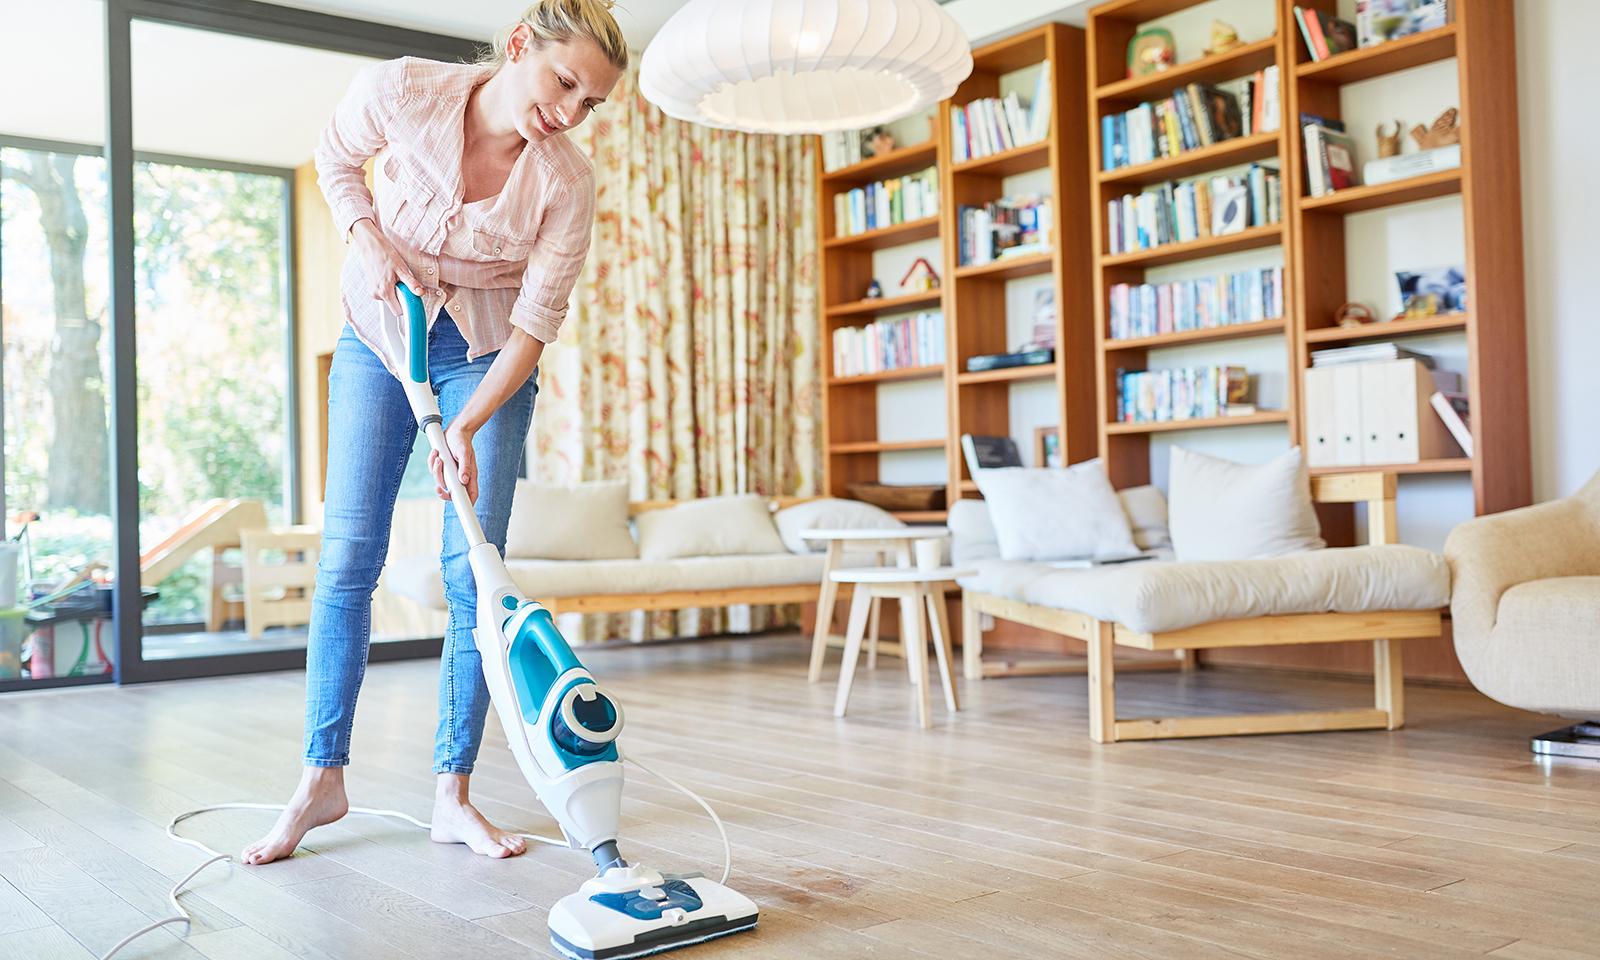 woman-using-steam-mop-on-hard-floor-main-image